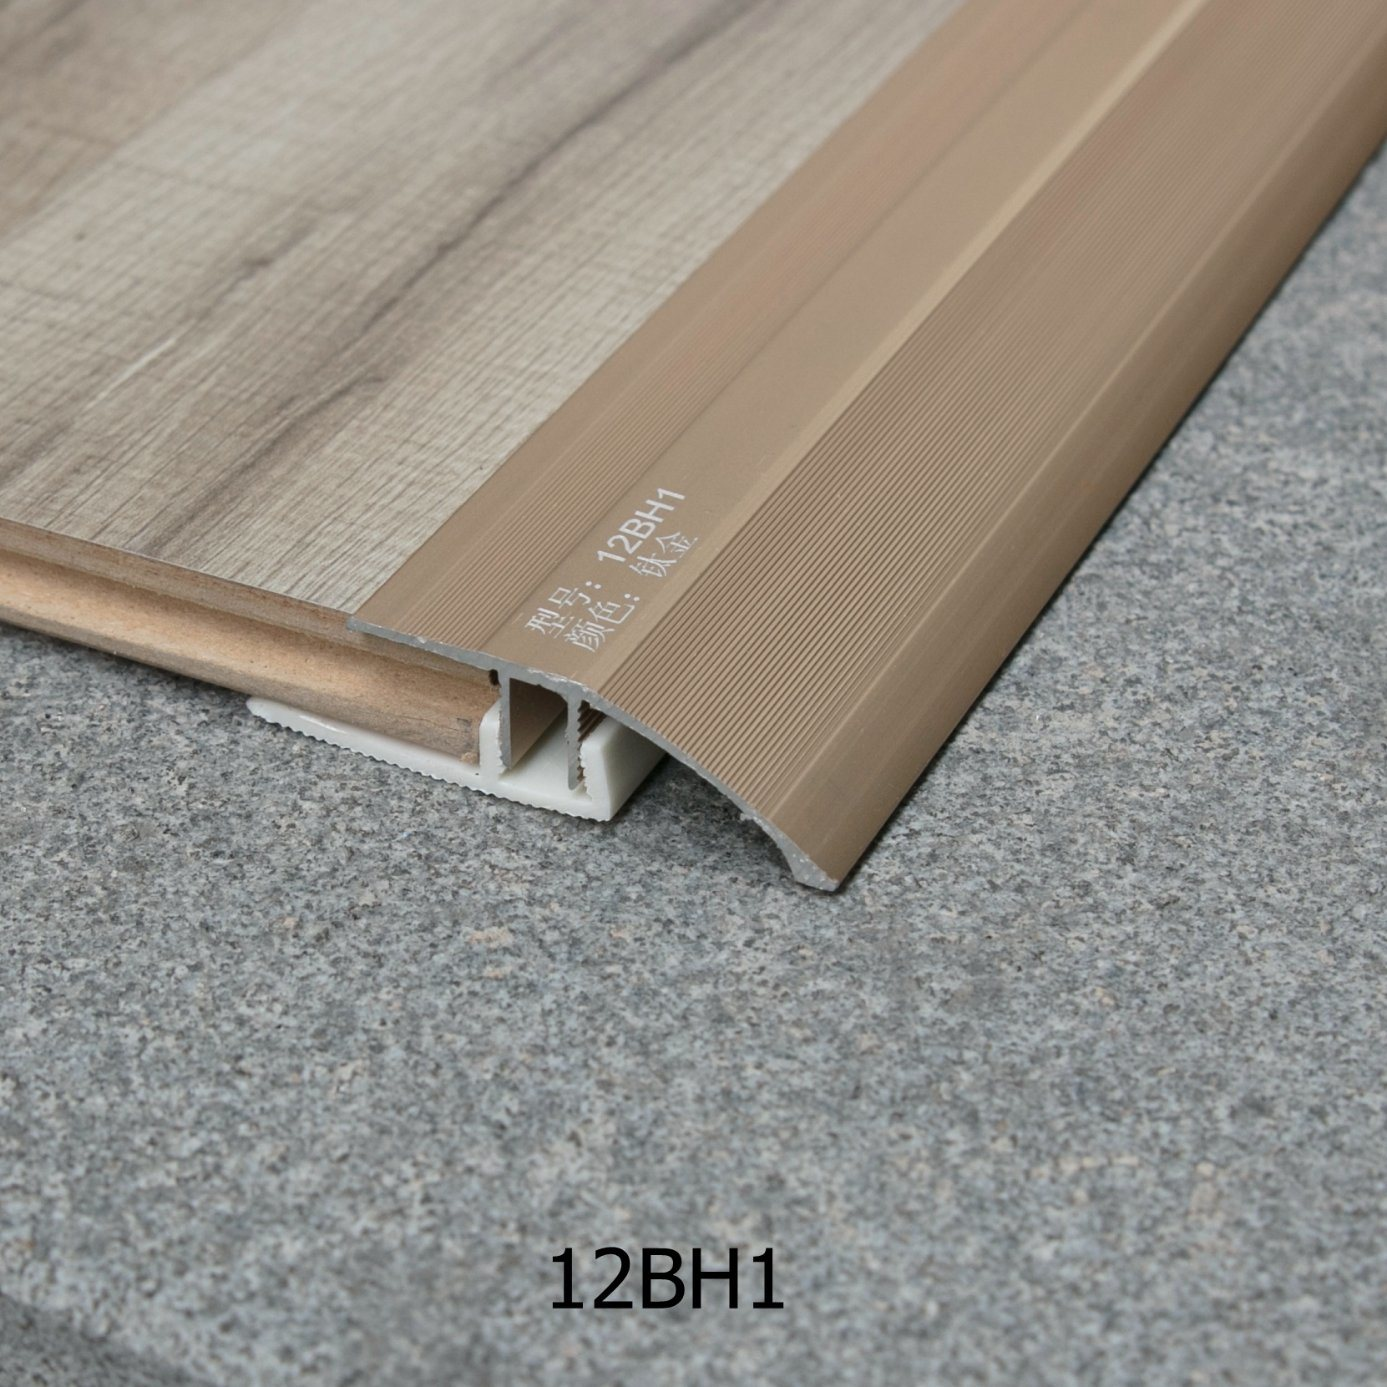 Reducer Transition Flooring Accessories